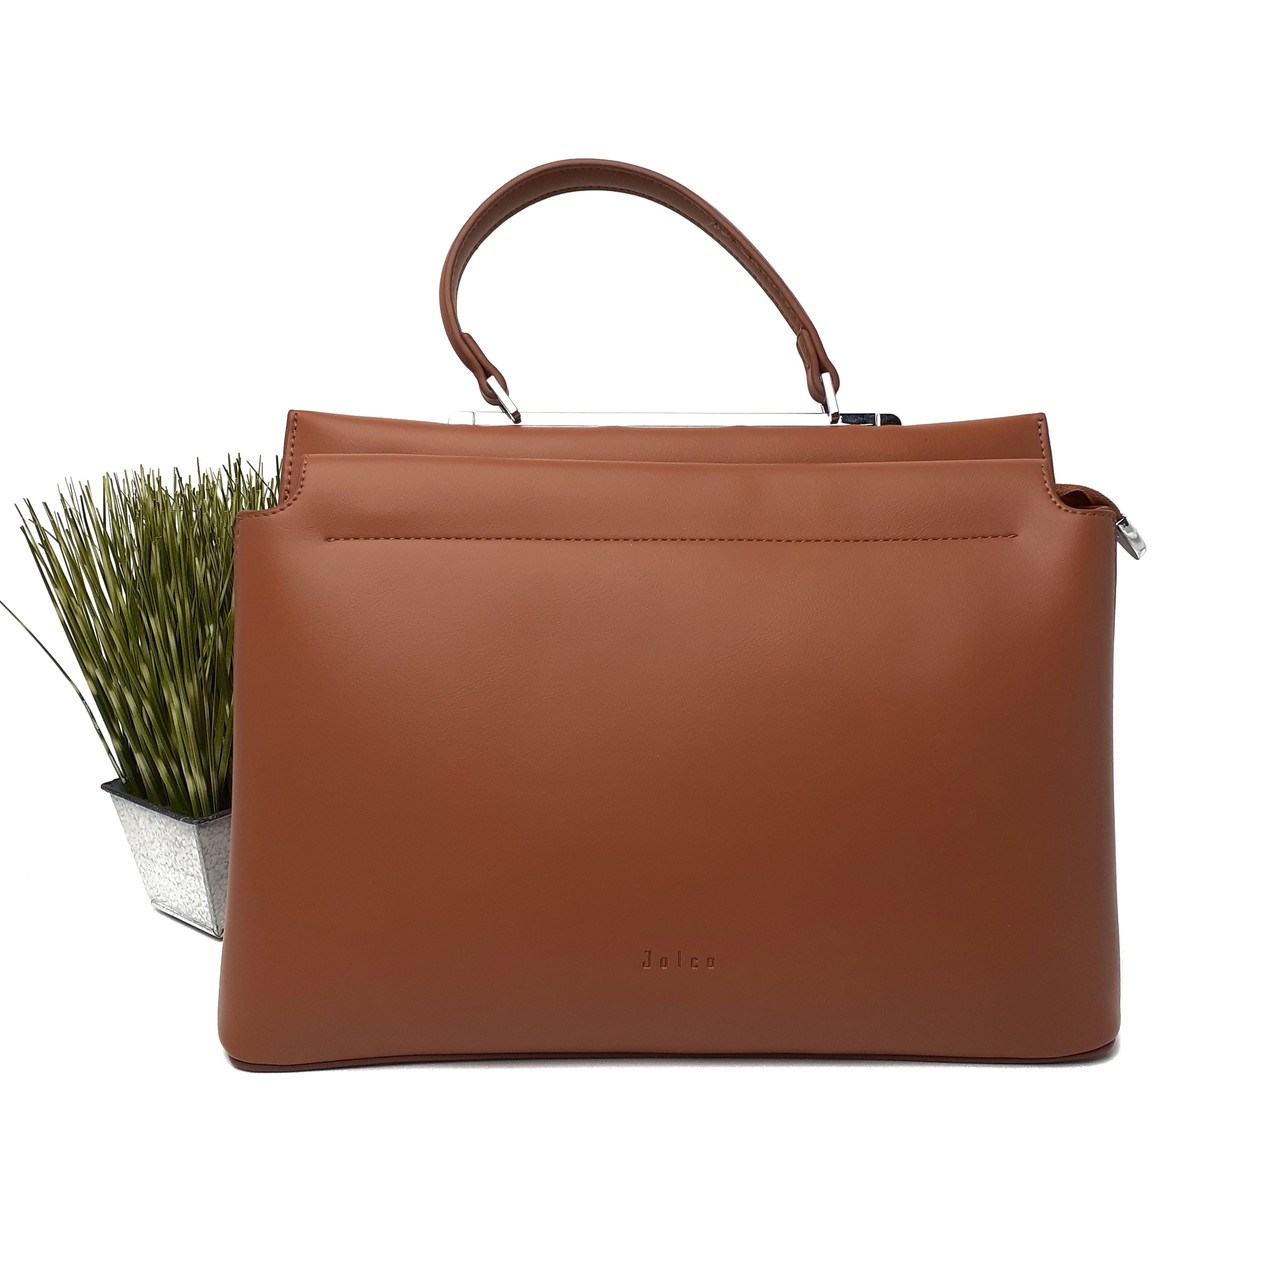 Велика жіноча сумка штучна шкіра руда Арт.XBY-20200712 brown Johnny (Китай)